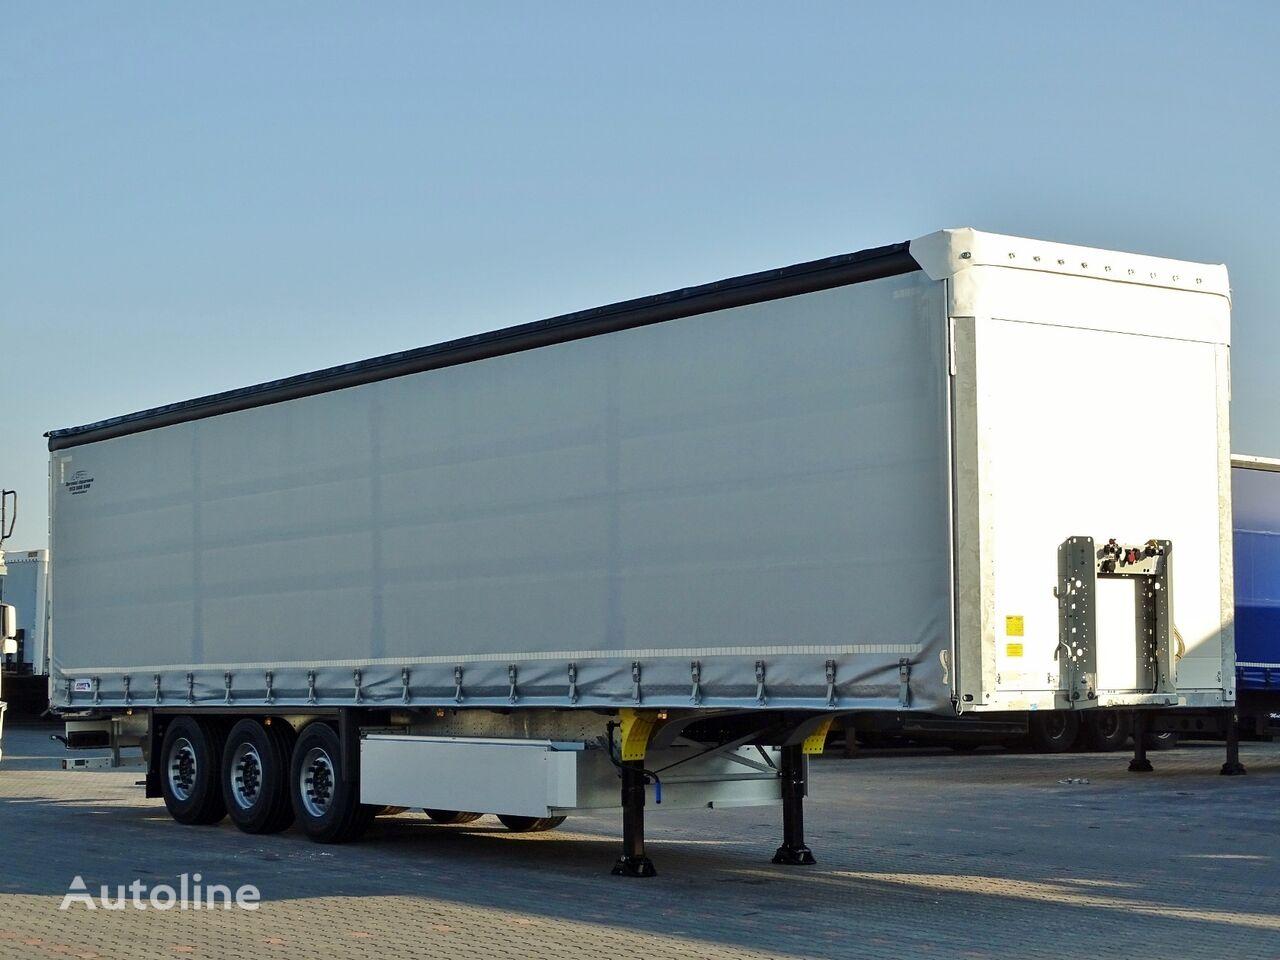 SCHMITZ CARGOBULL CURTAINSIDER / STANDARD / LIFTED AXLE / PALLET BOX / 11.2020 / curtain side semi-trailer